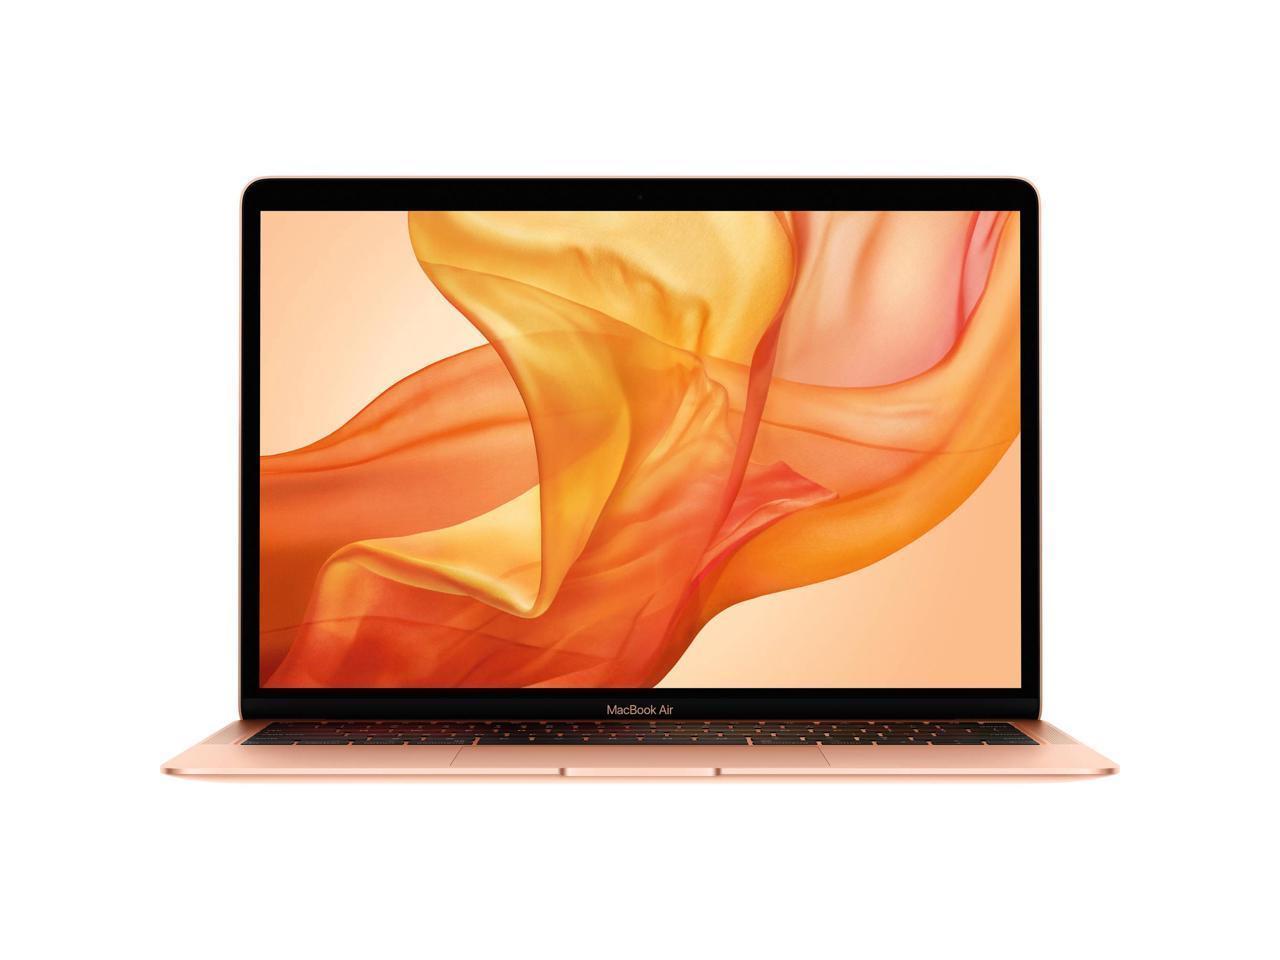 macbook air late 2018